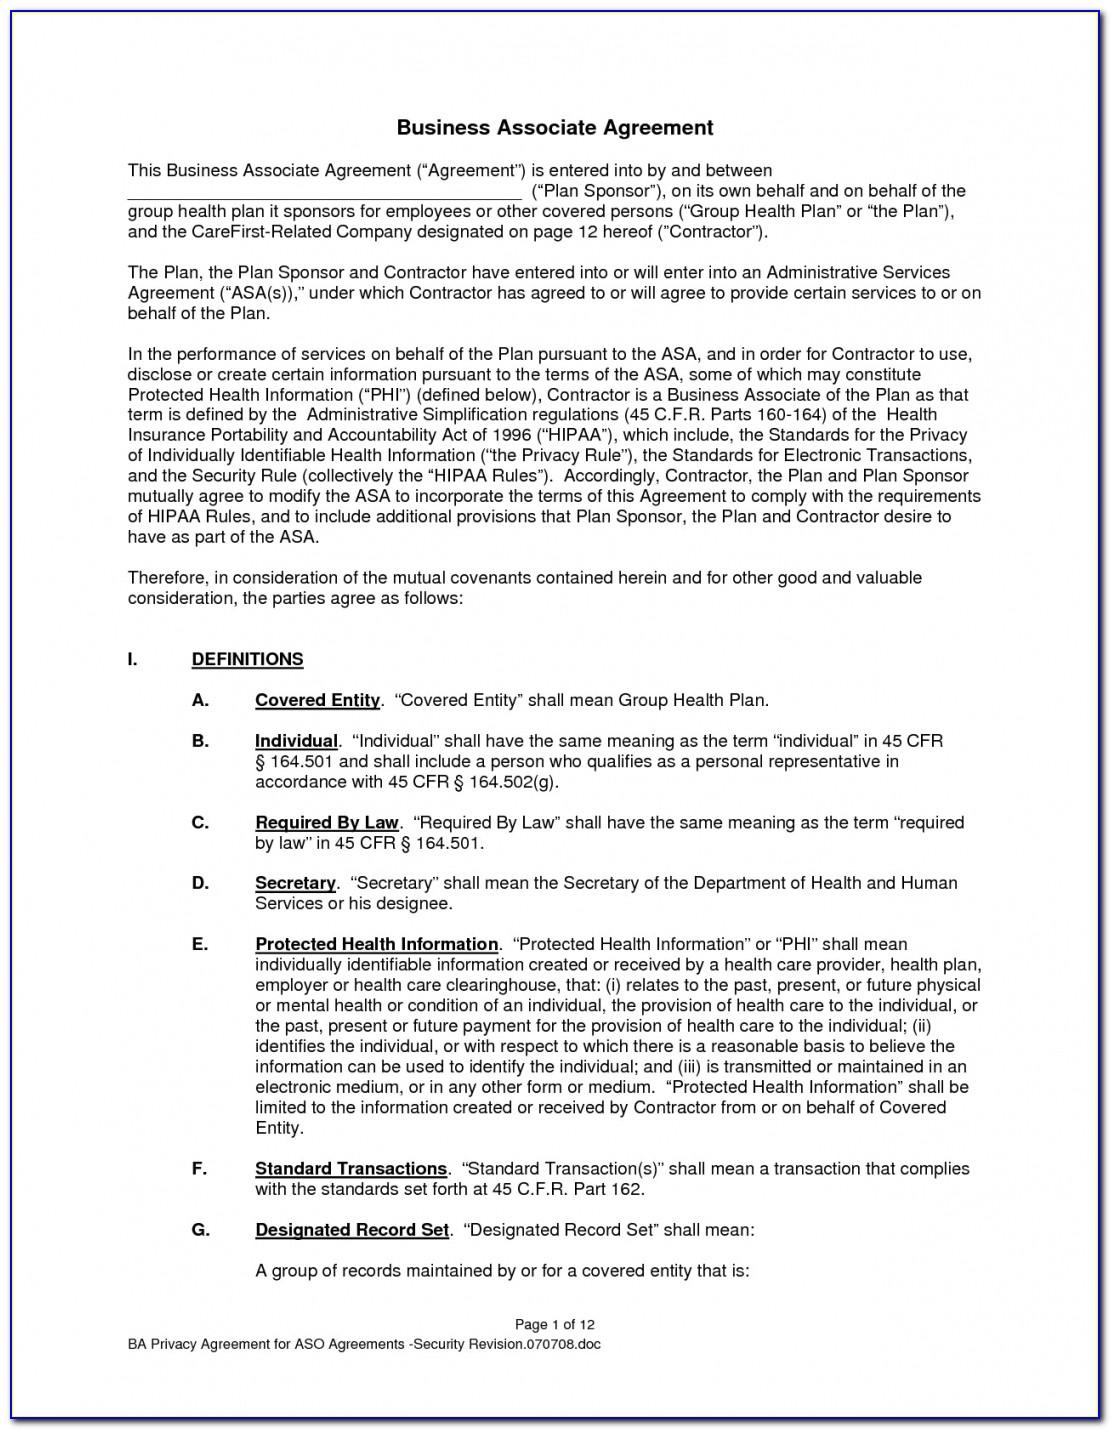 Business Associate Agreement Template Unorthodox Photos Hipaa Free Within Business Associate Agreement Template 2018